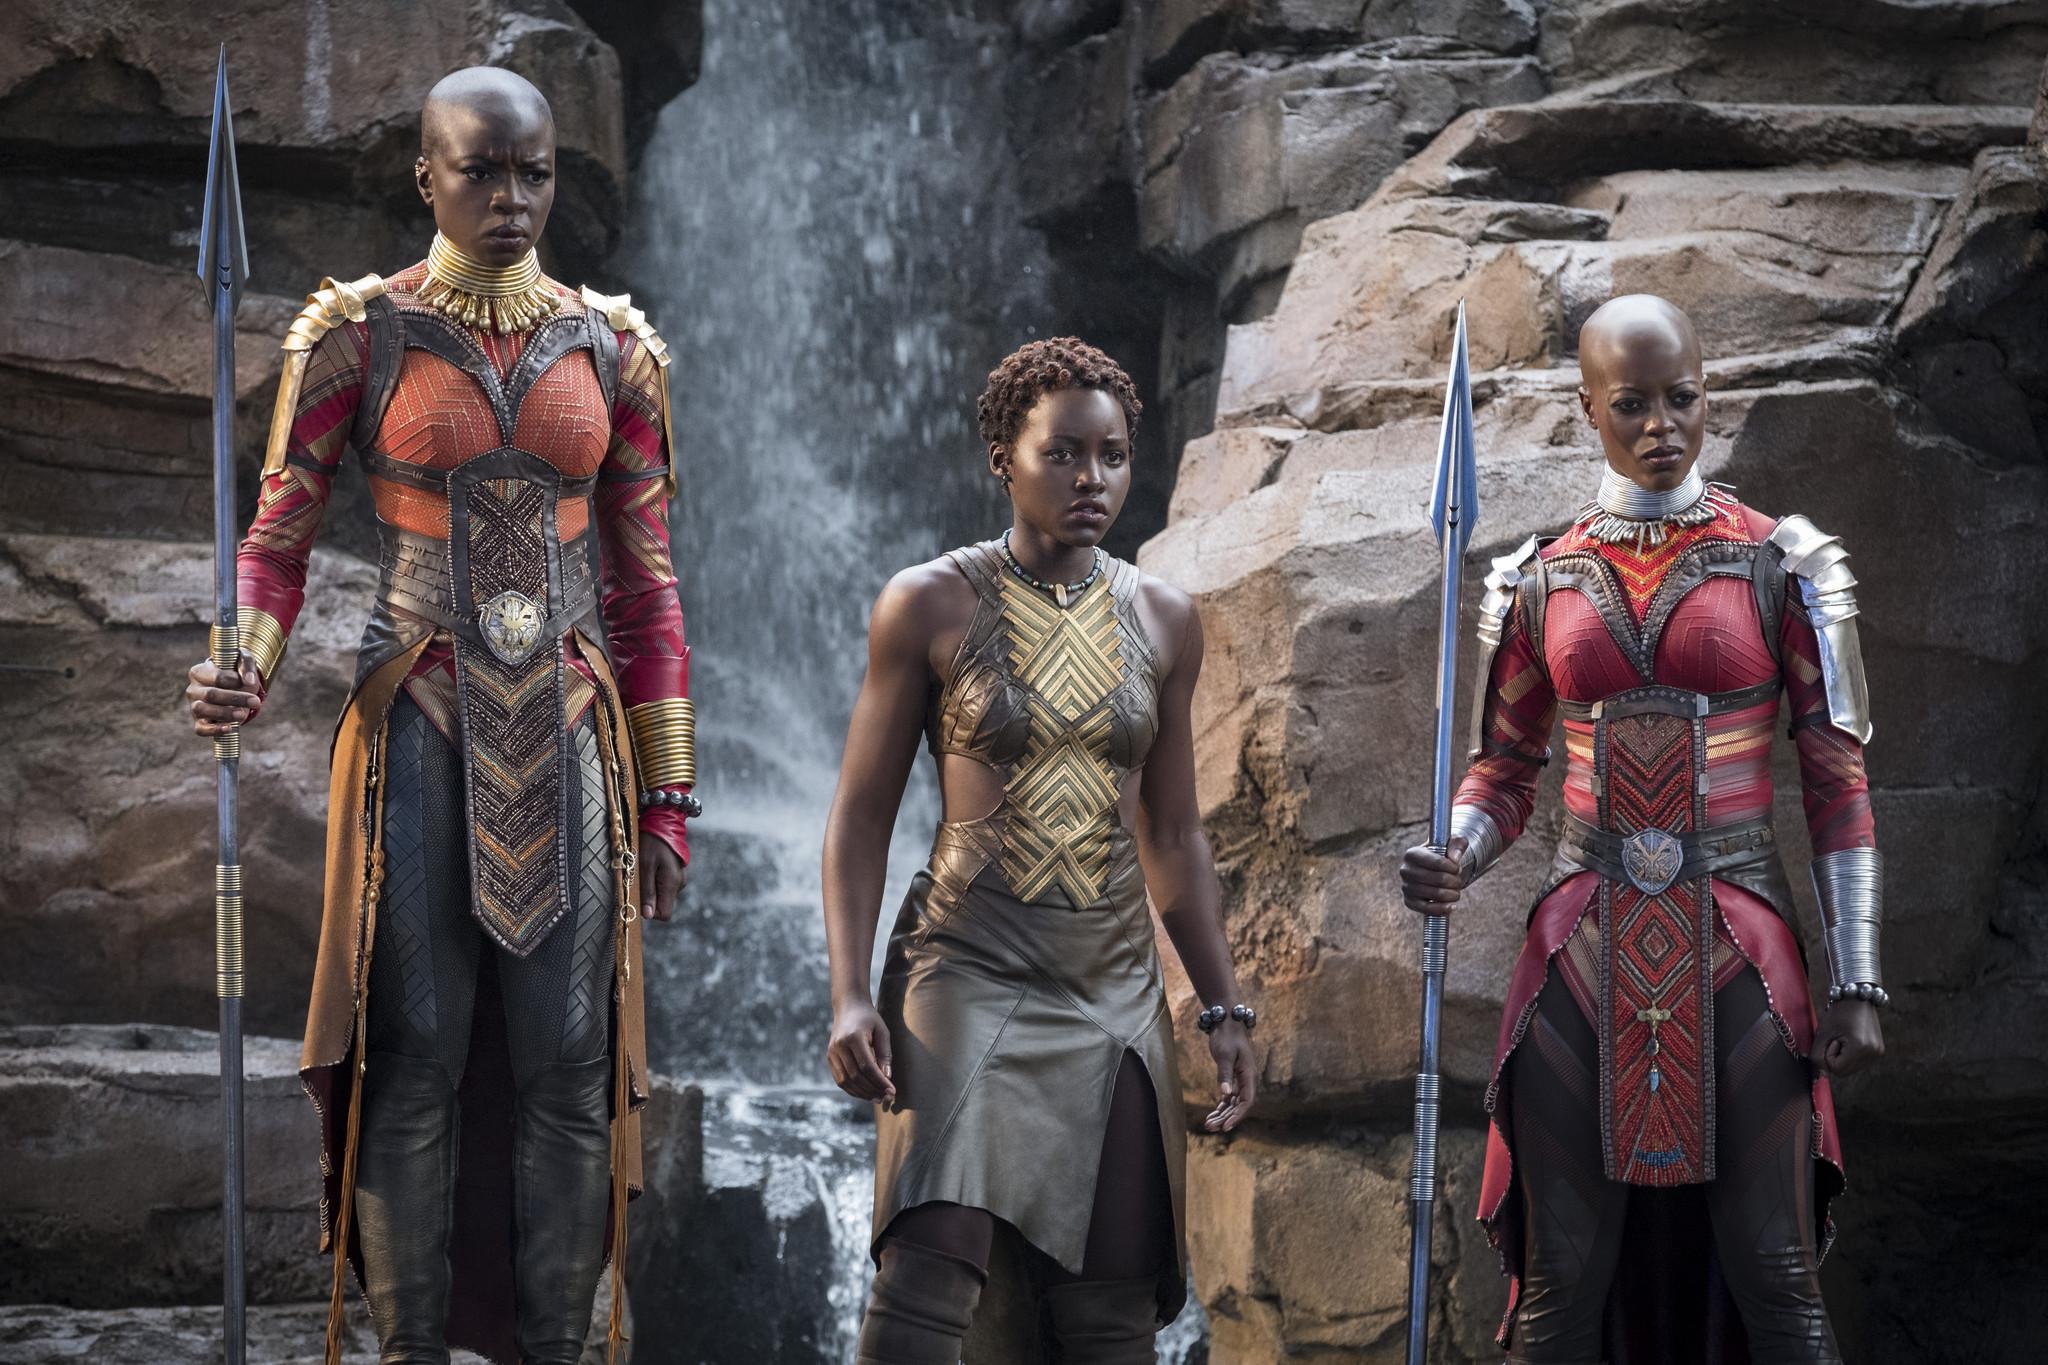 (L-R) - Okoye (Danai Gurira), Nakia (Lupita Nyong'o) and Ayo (Florence Kasumba) in a scene from Mar